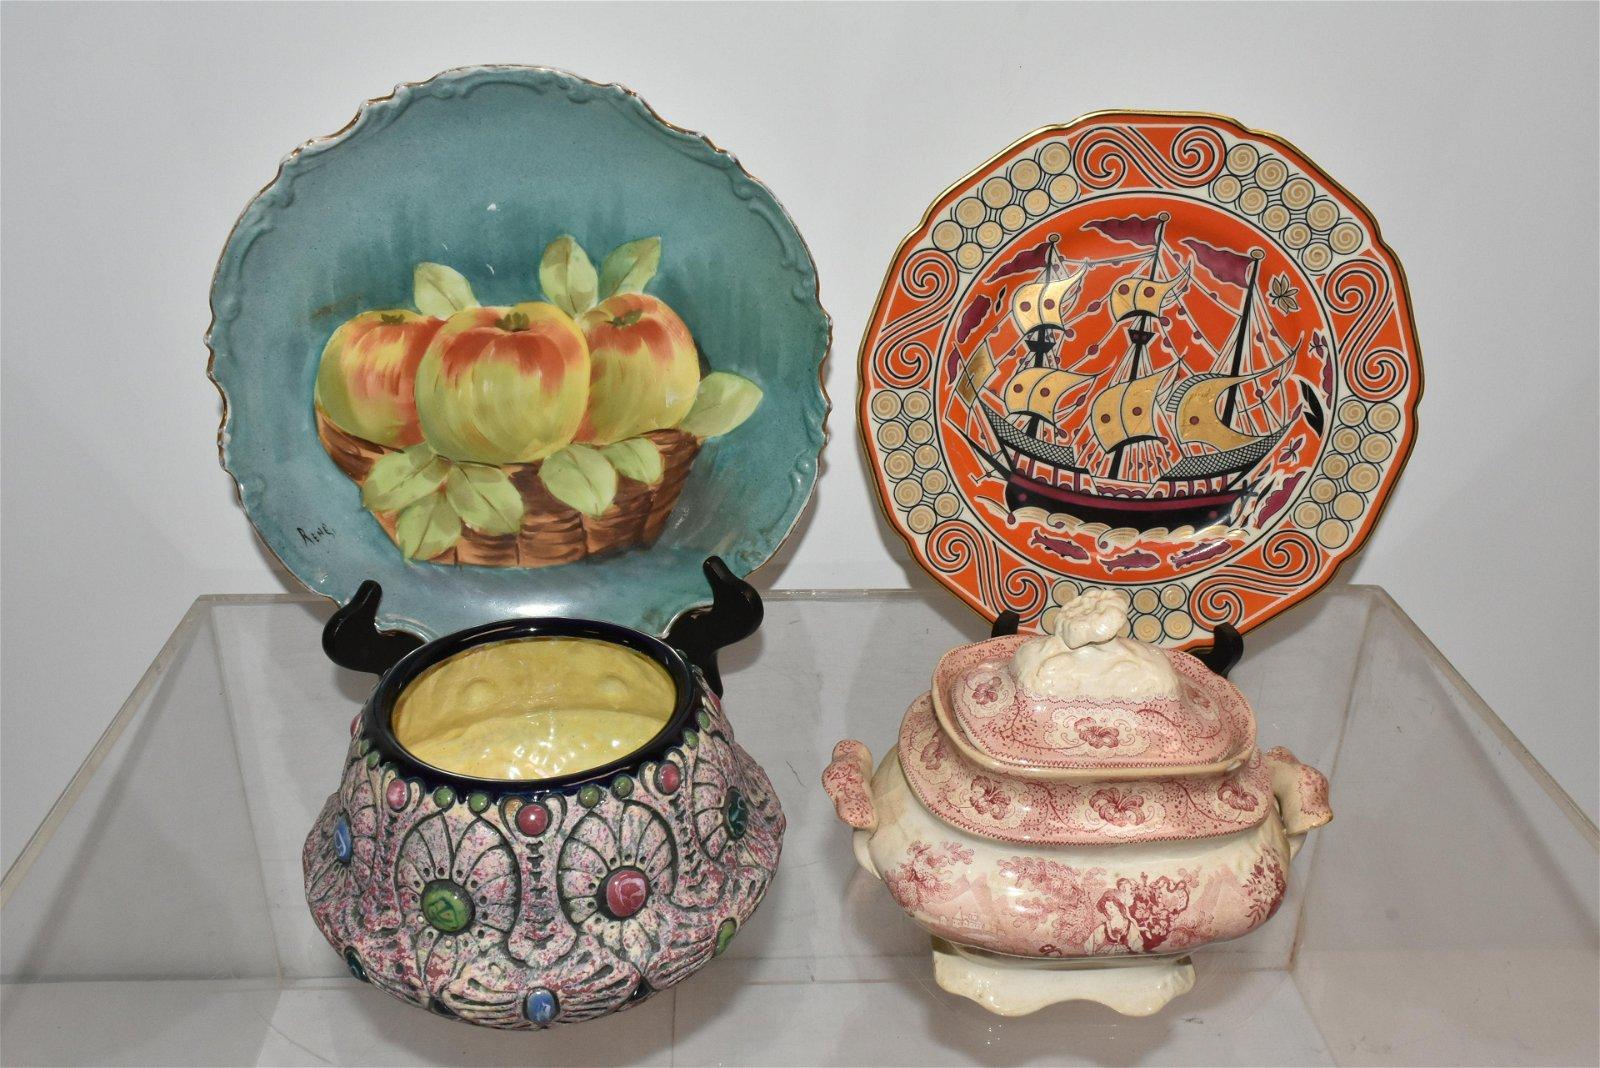 Miscellaneous Vintage Pottery and Porcelain